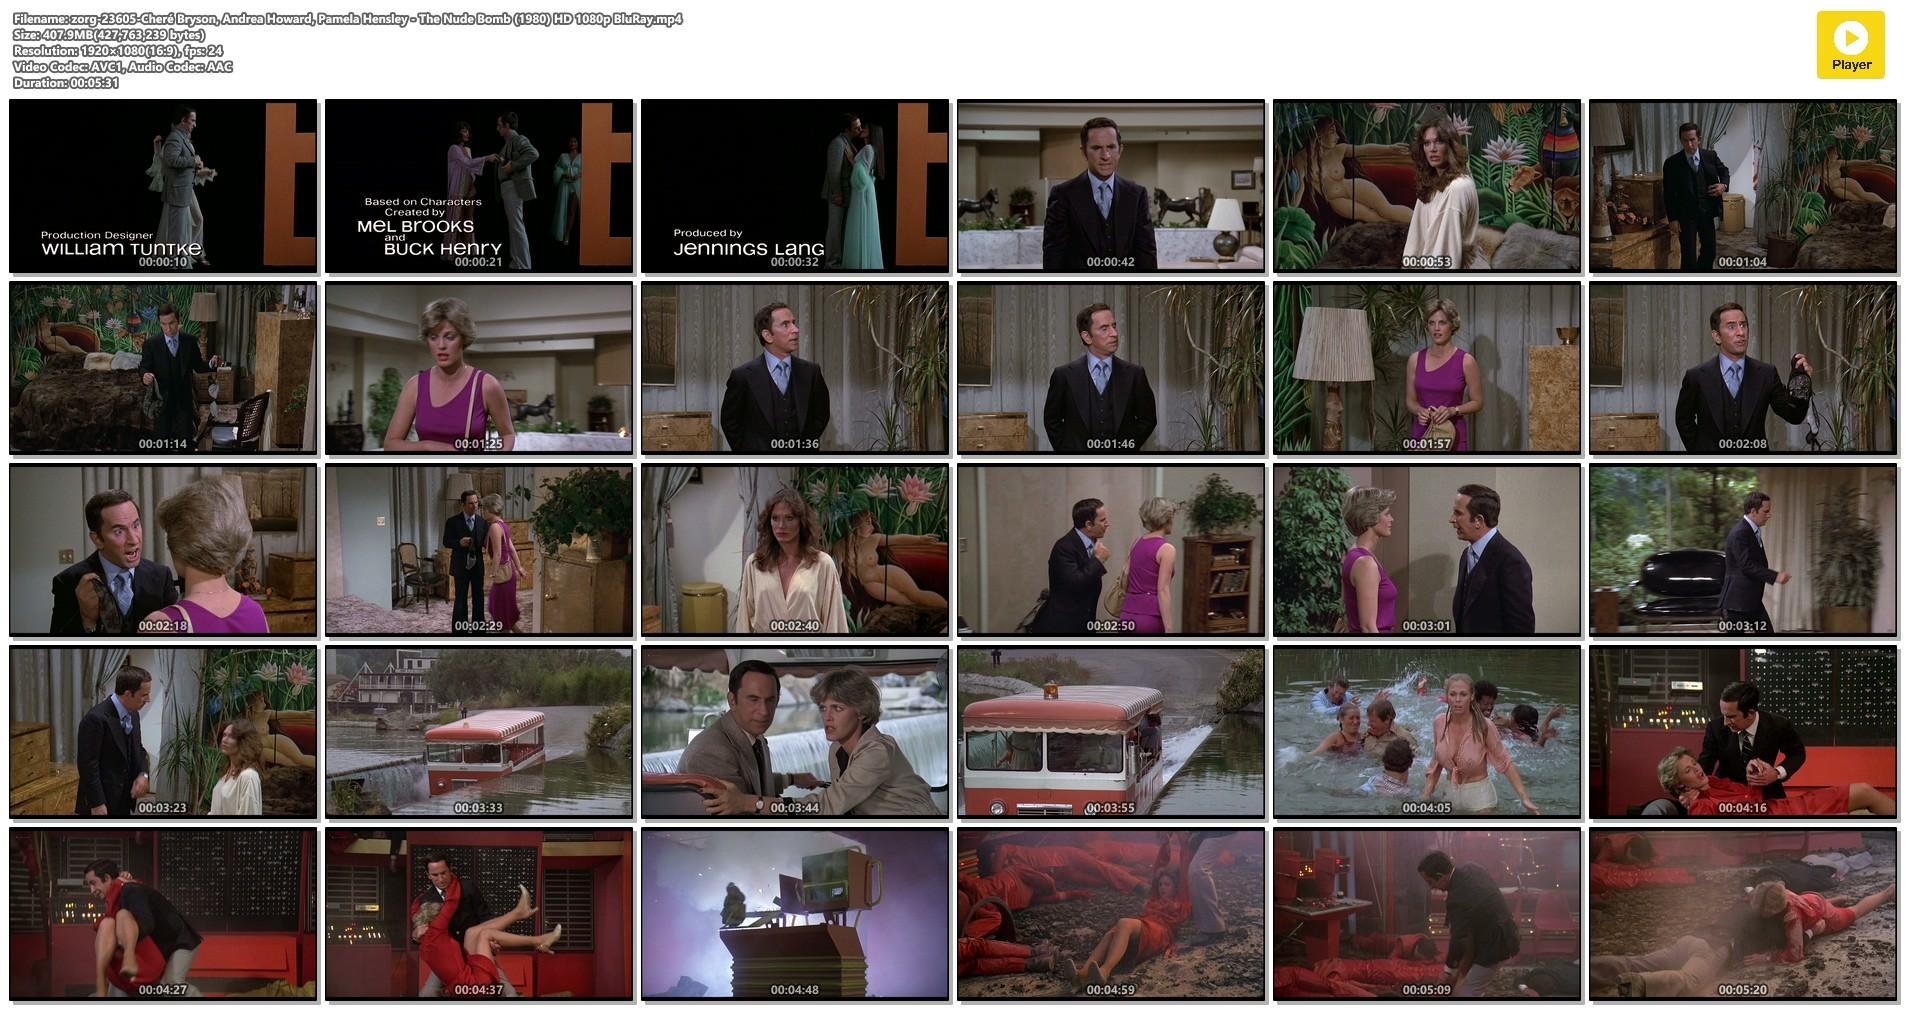 Cheré Bryson busty see through Andrea Howard, Pamela Hensley hot - The Nude Bomb (1980) HD 1080p BluRay (1)